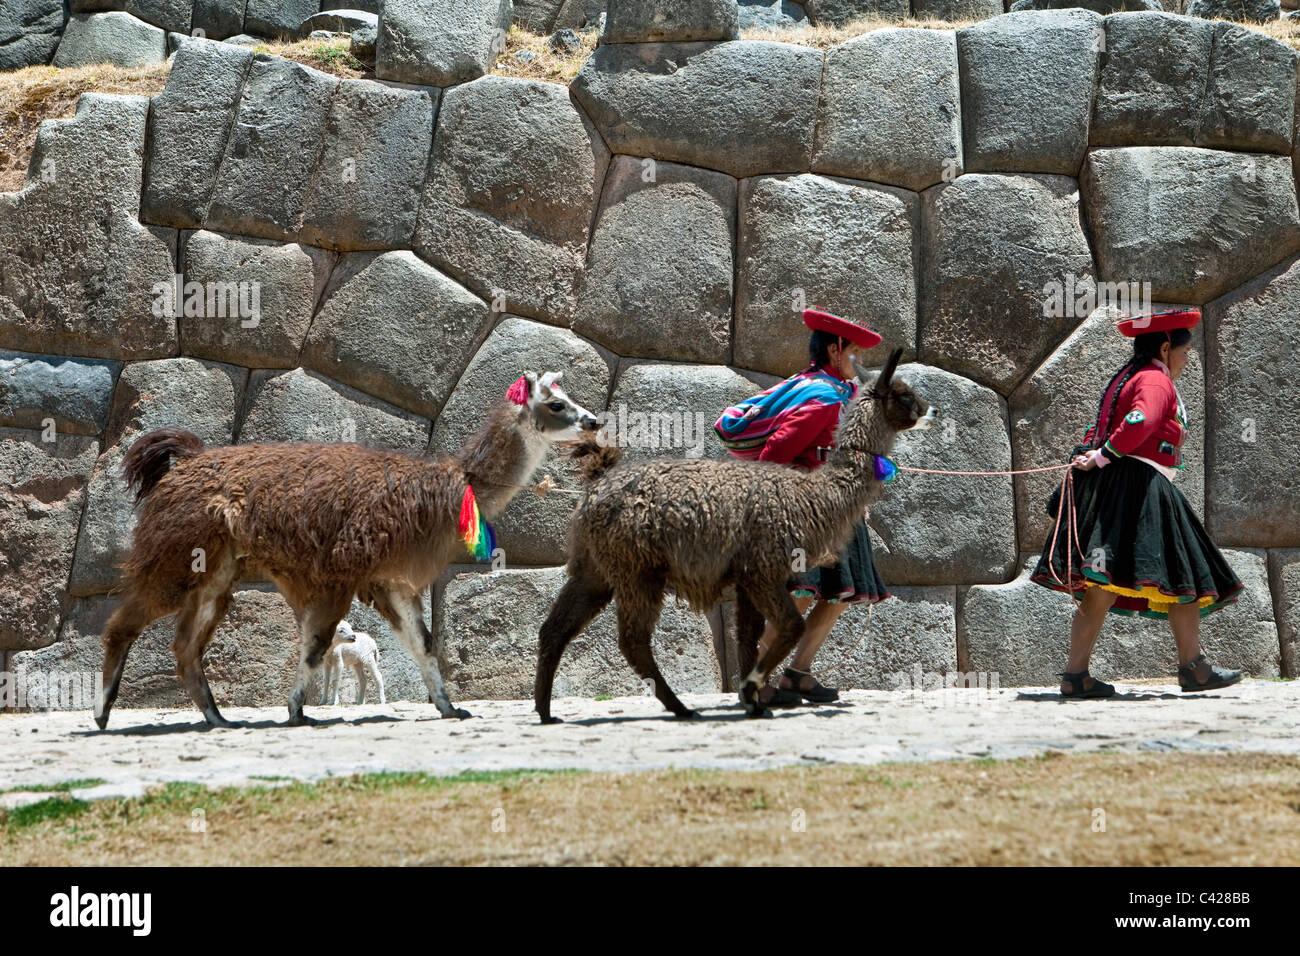 Peru, Cusco, Cuzco, Saqsayhuaman, Sacsayhuaman, Sacsaywaman. Indian women with llamas and Alpaca. UNESCO World Heritage - Stock Image